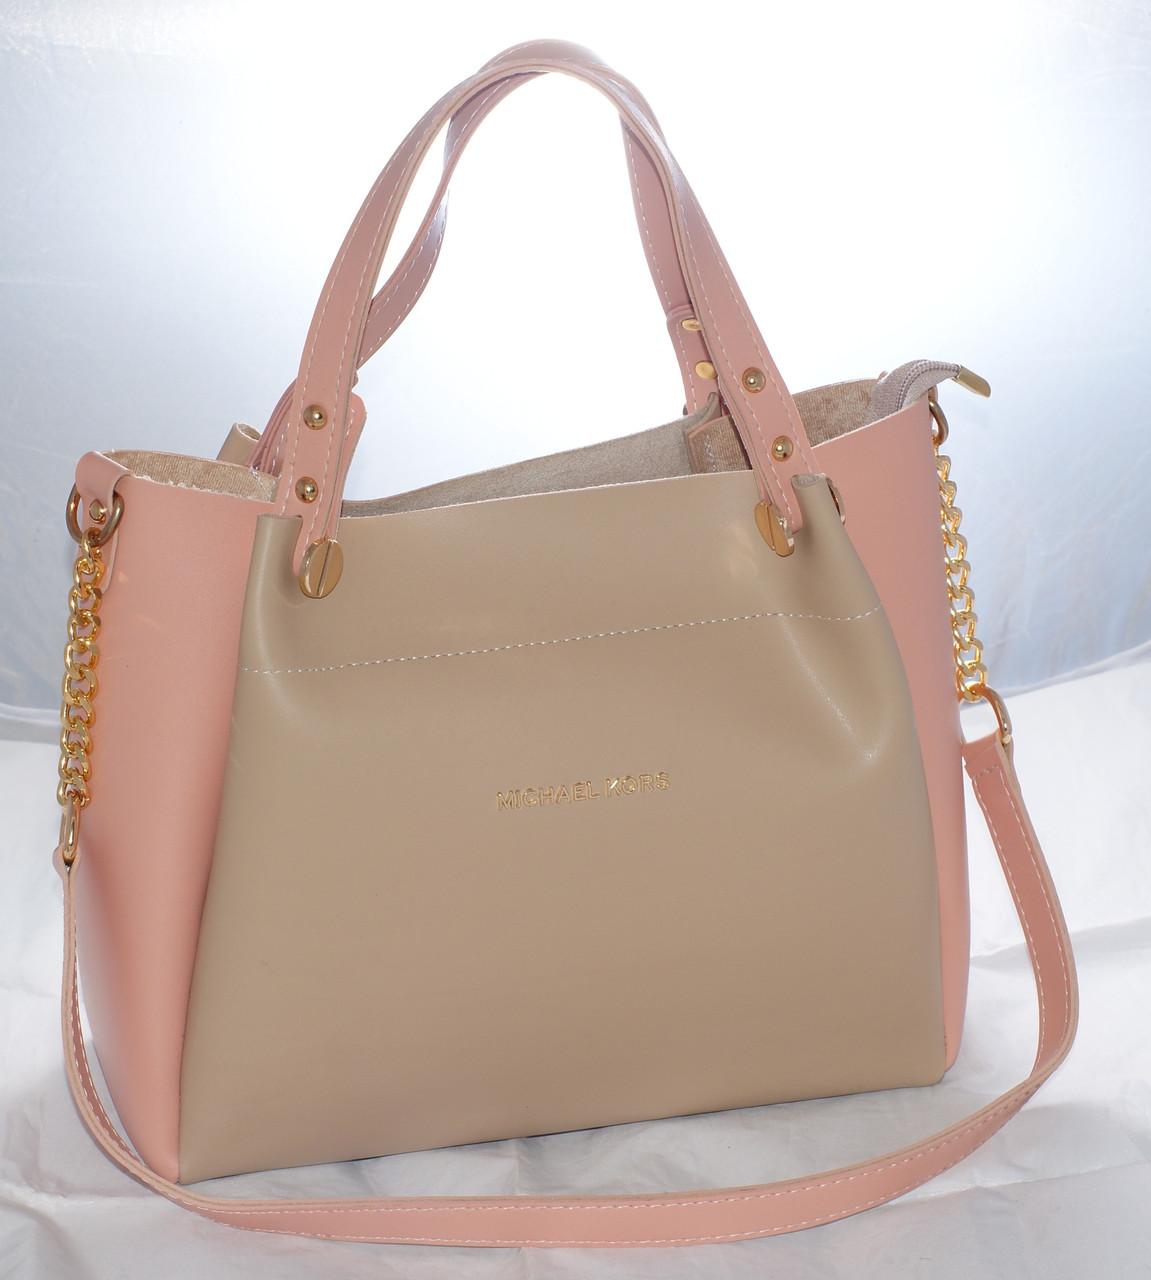 b70250b4c324 Женская сумка Michael Kors (Майкл Корс), бежевая с розовым  продажа ...